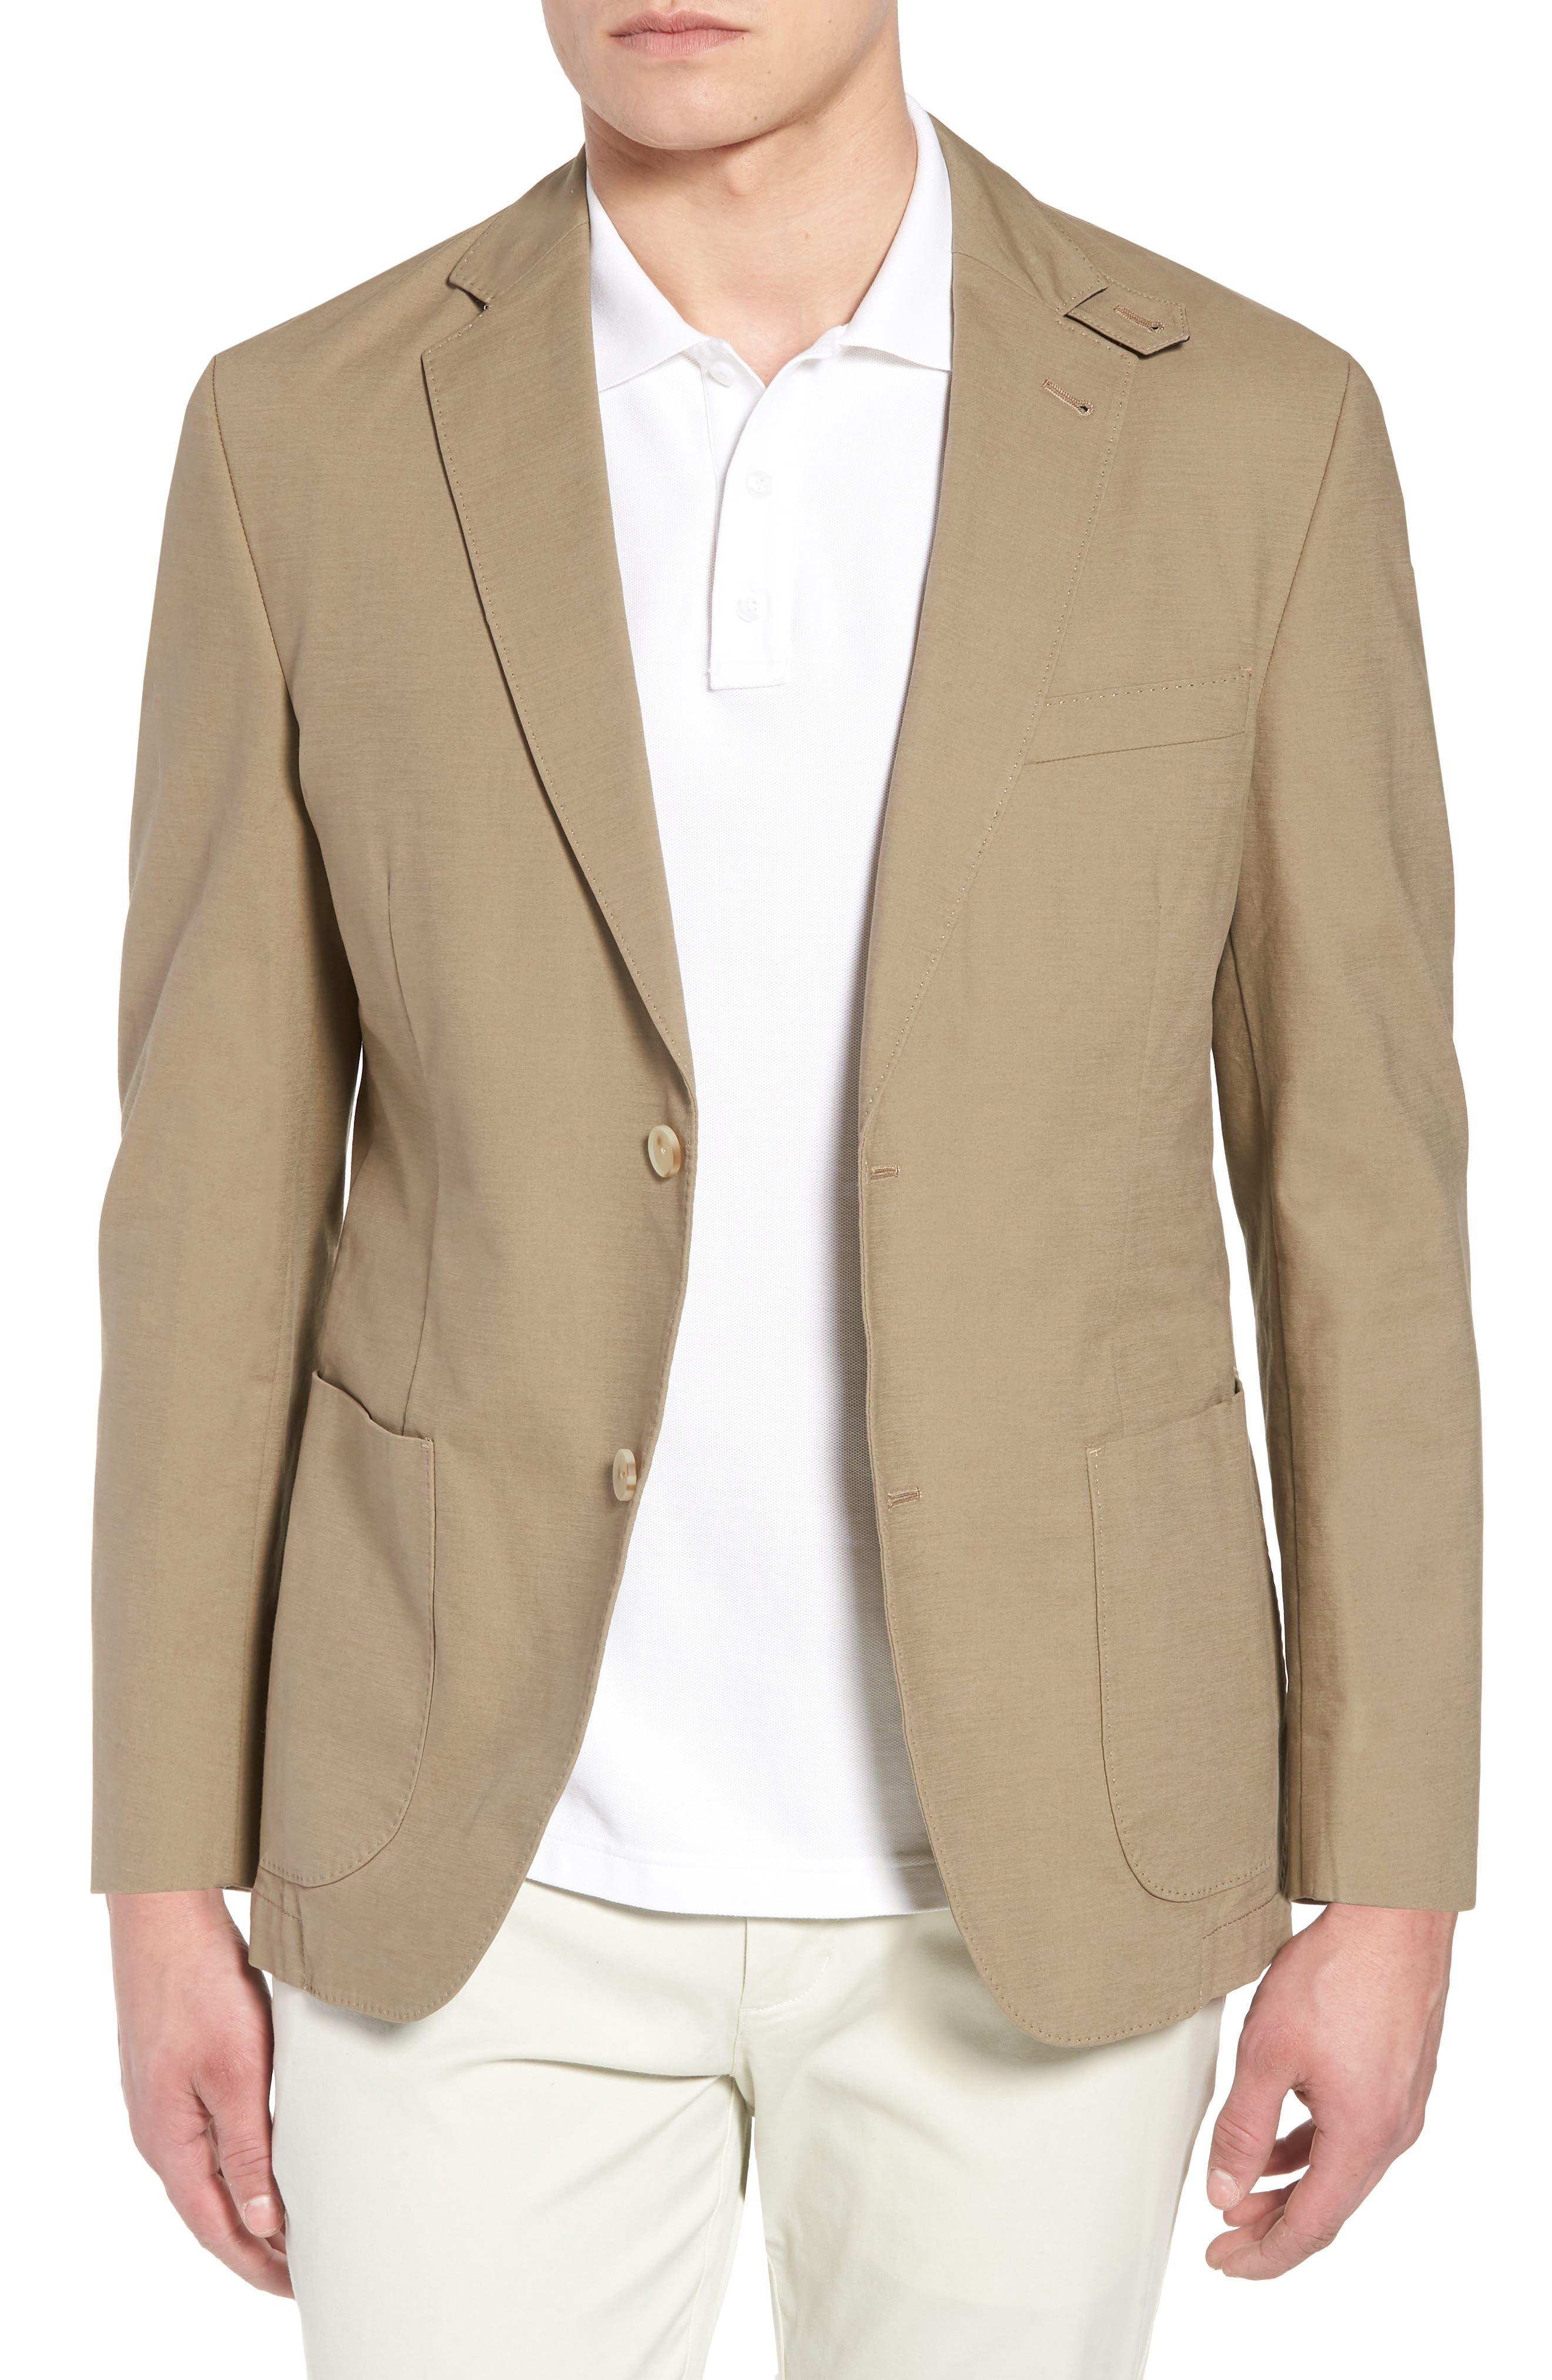 Bono AIM Classic Fit Stretch Cotton Blazer,                             Main thumbnail 1, color,                             252